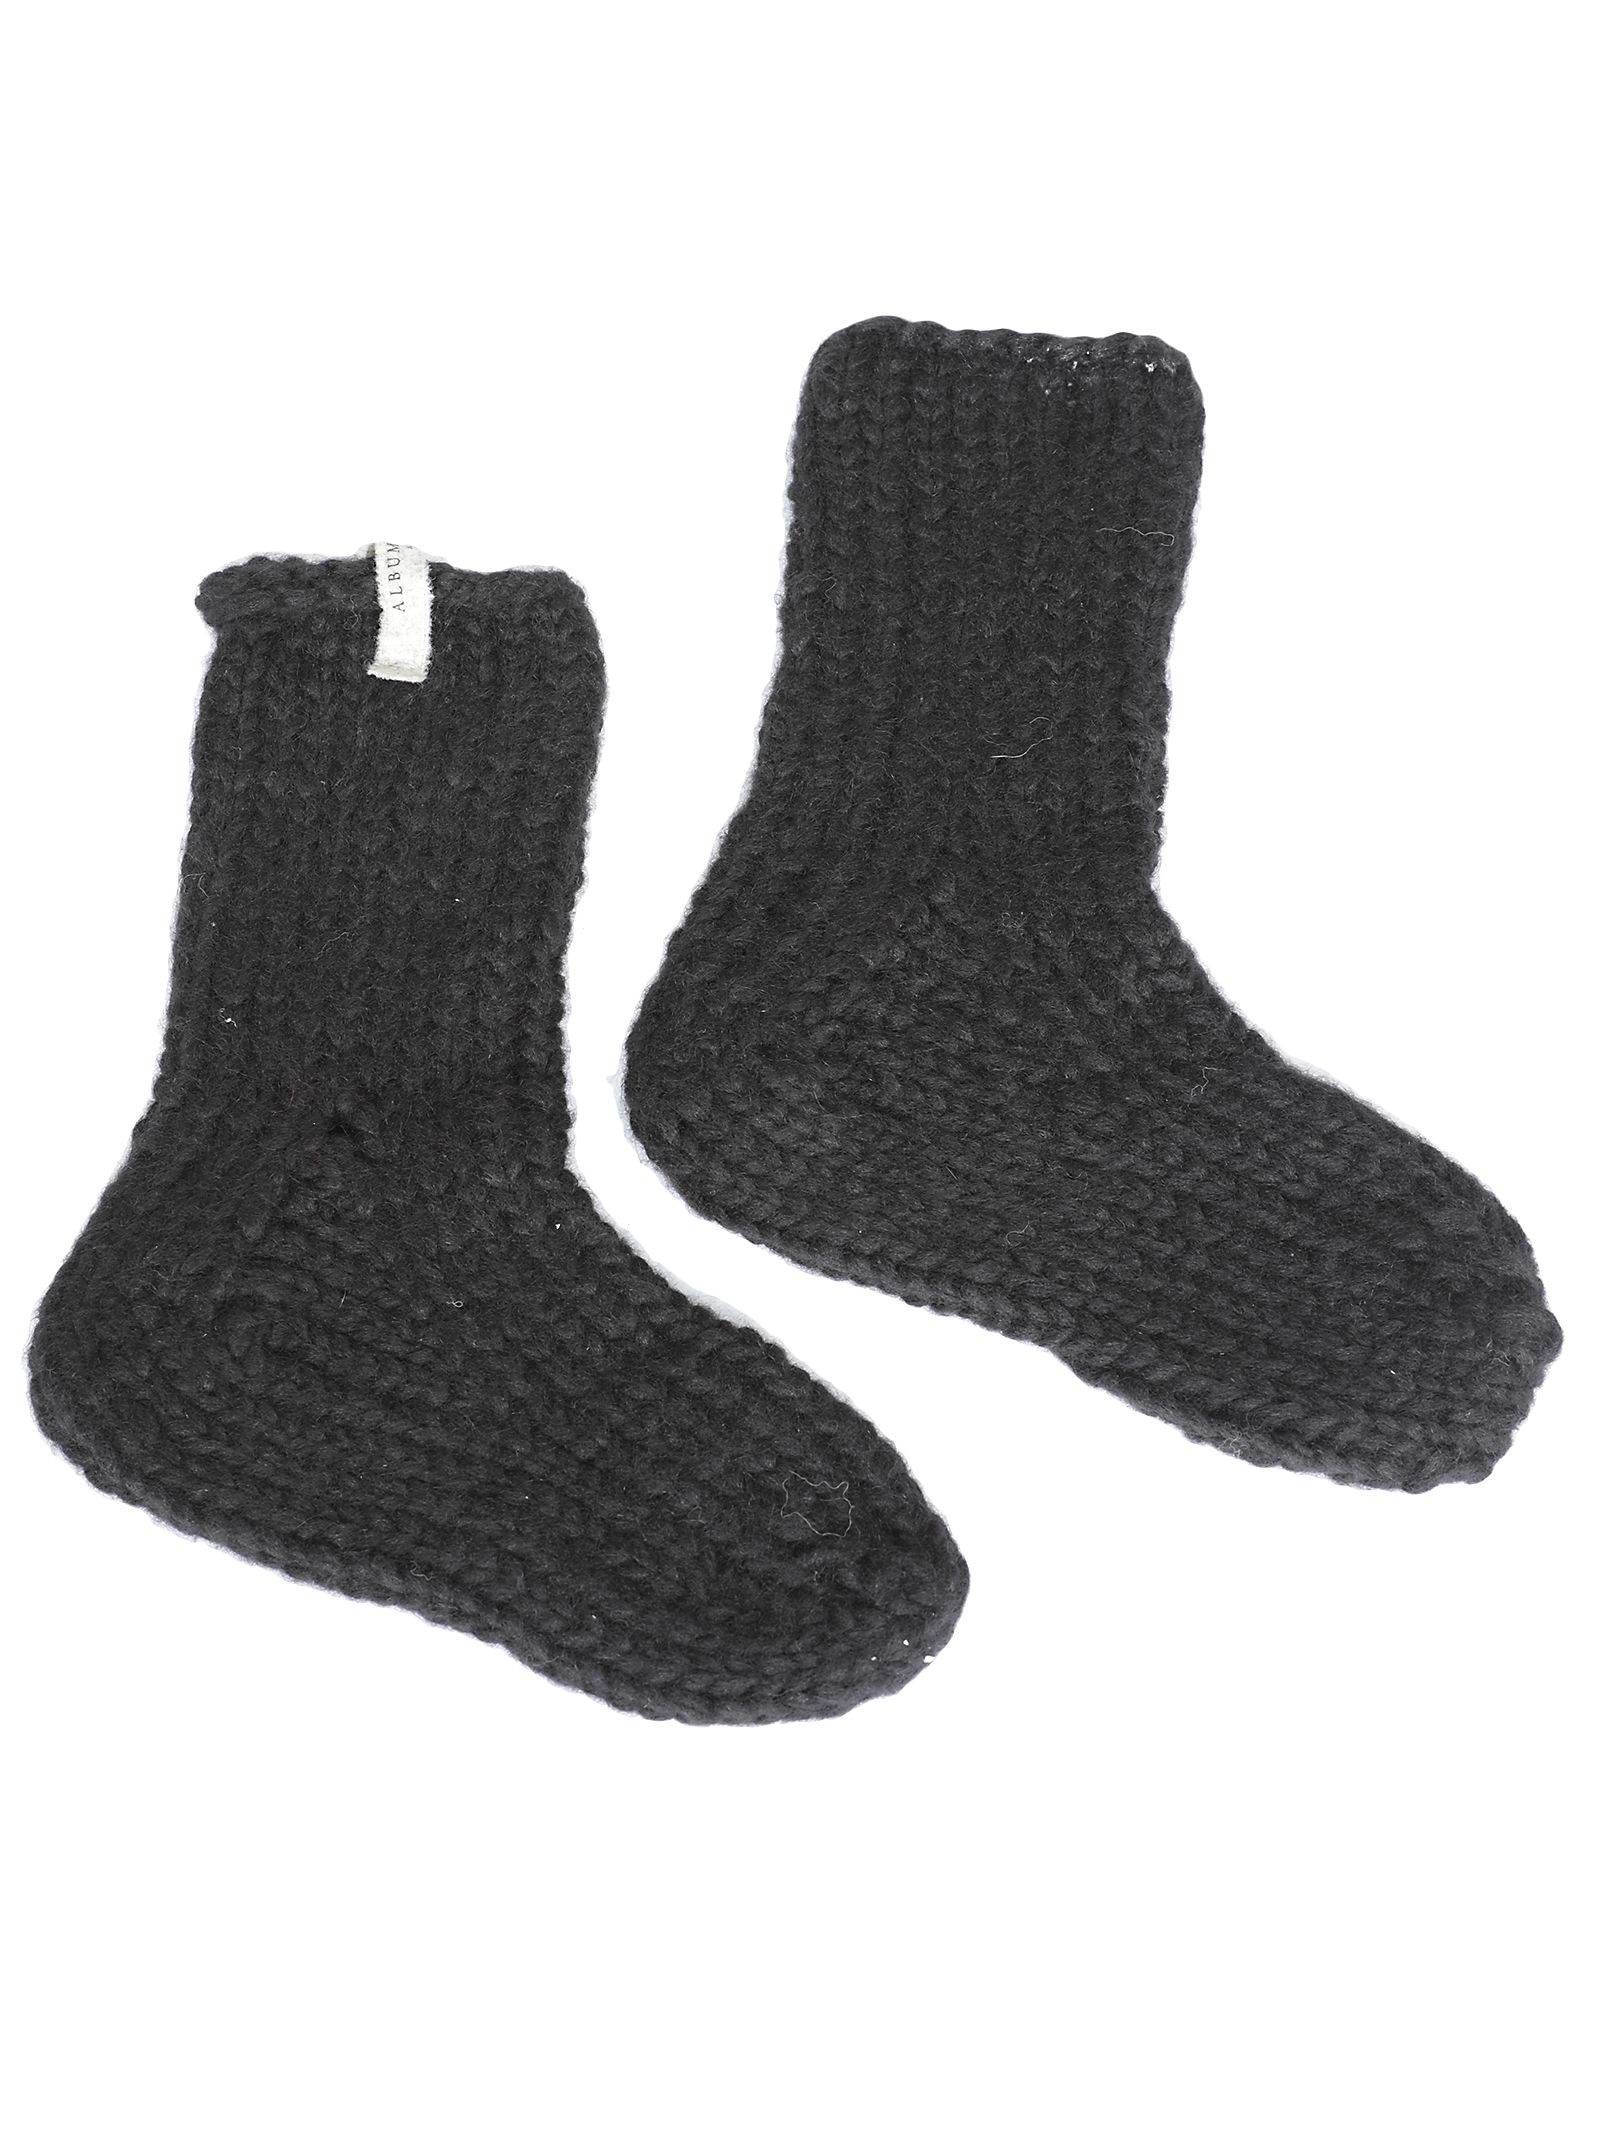 ALBUM DI FAMIGLIA Wool Socks in Black